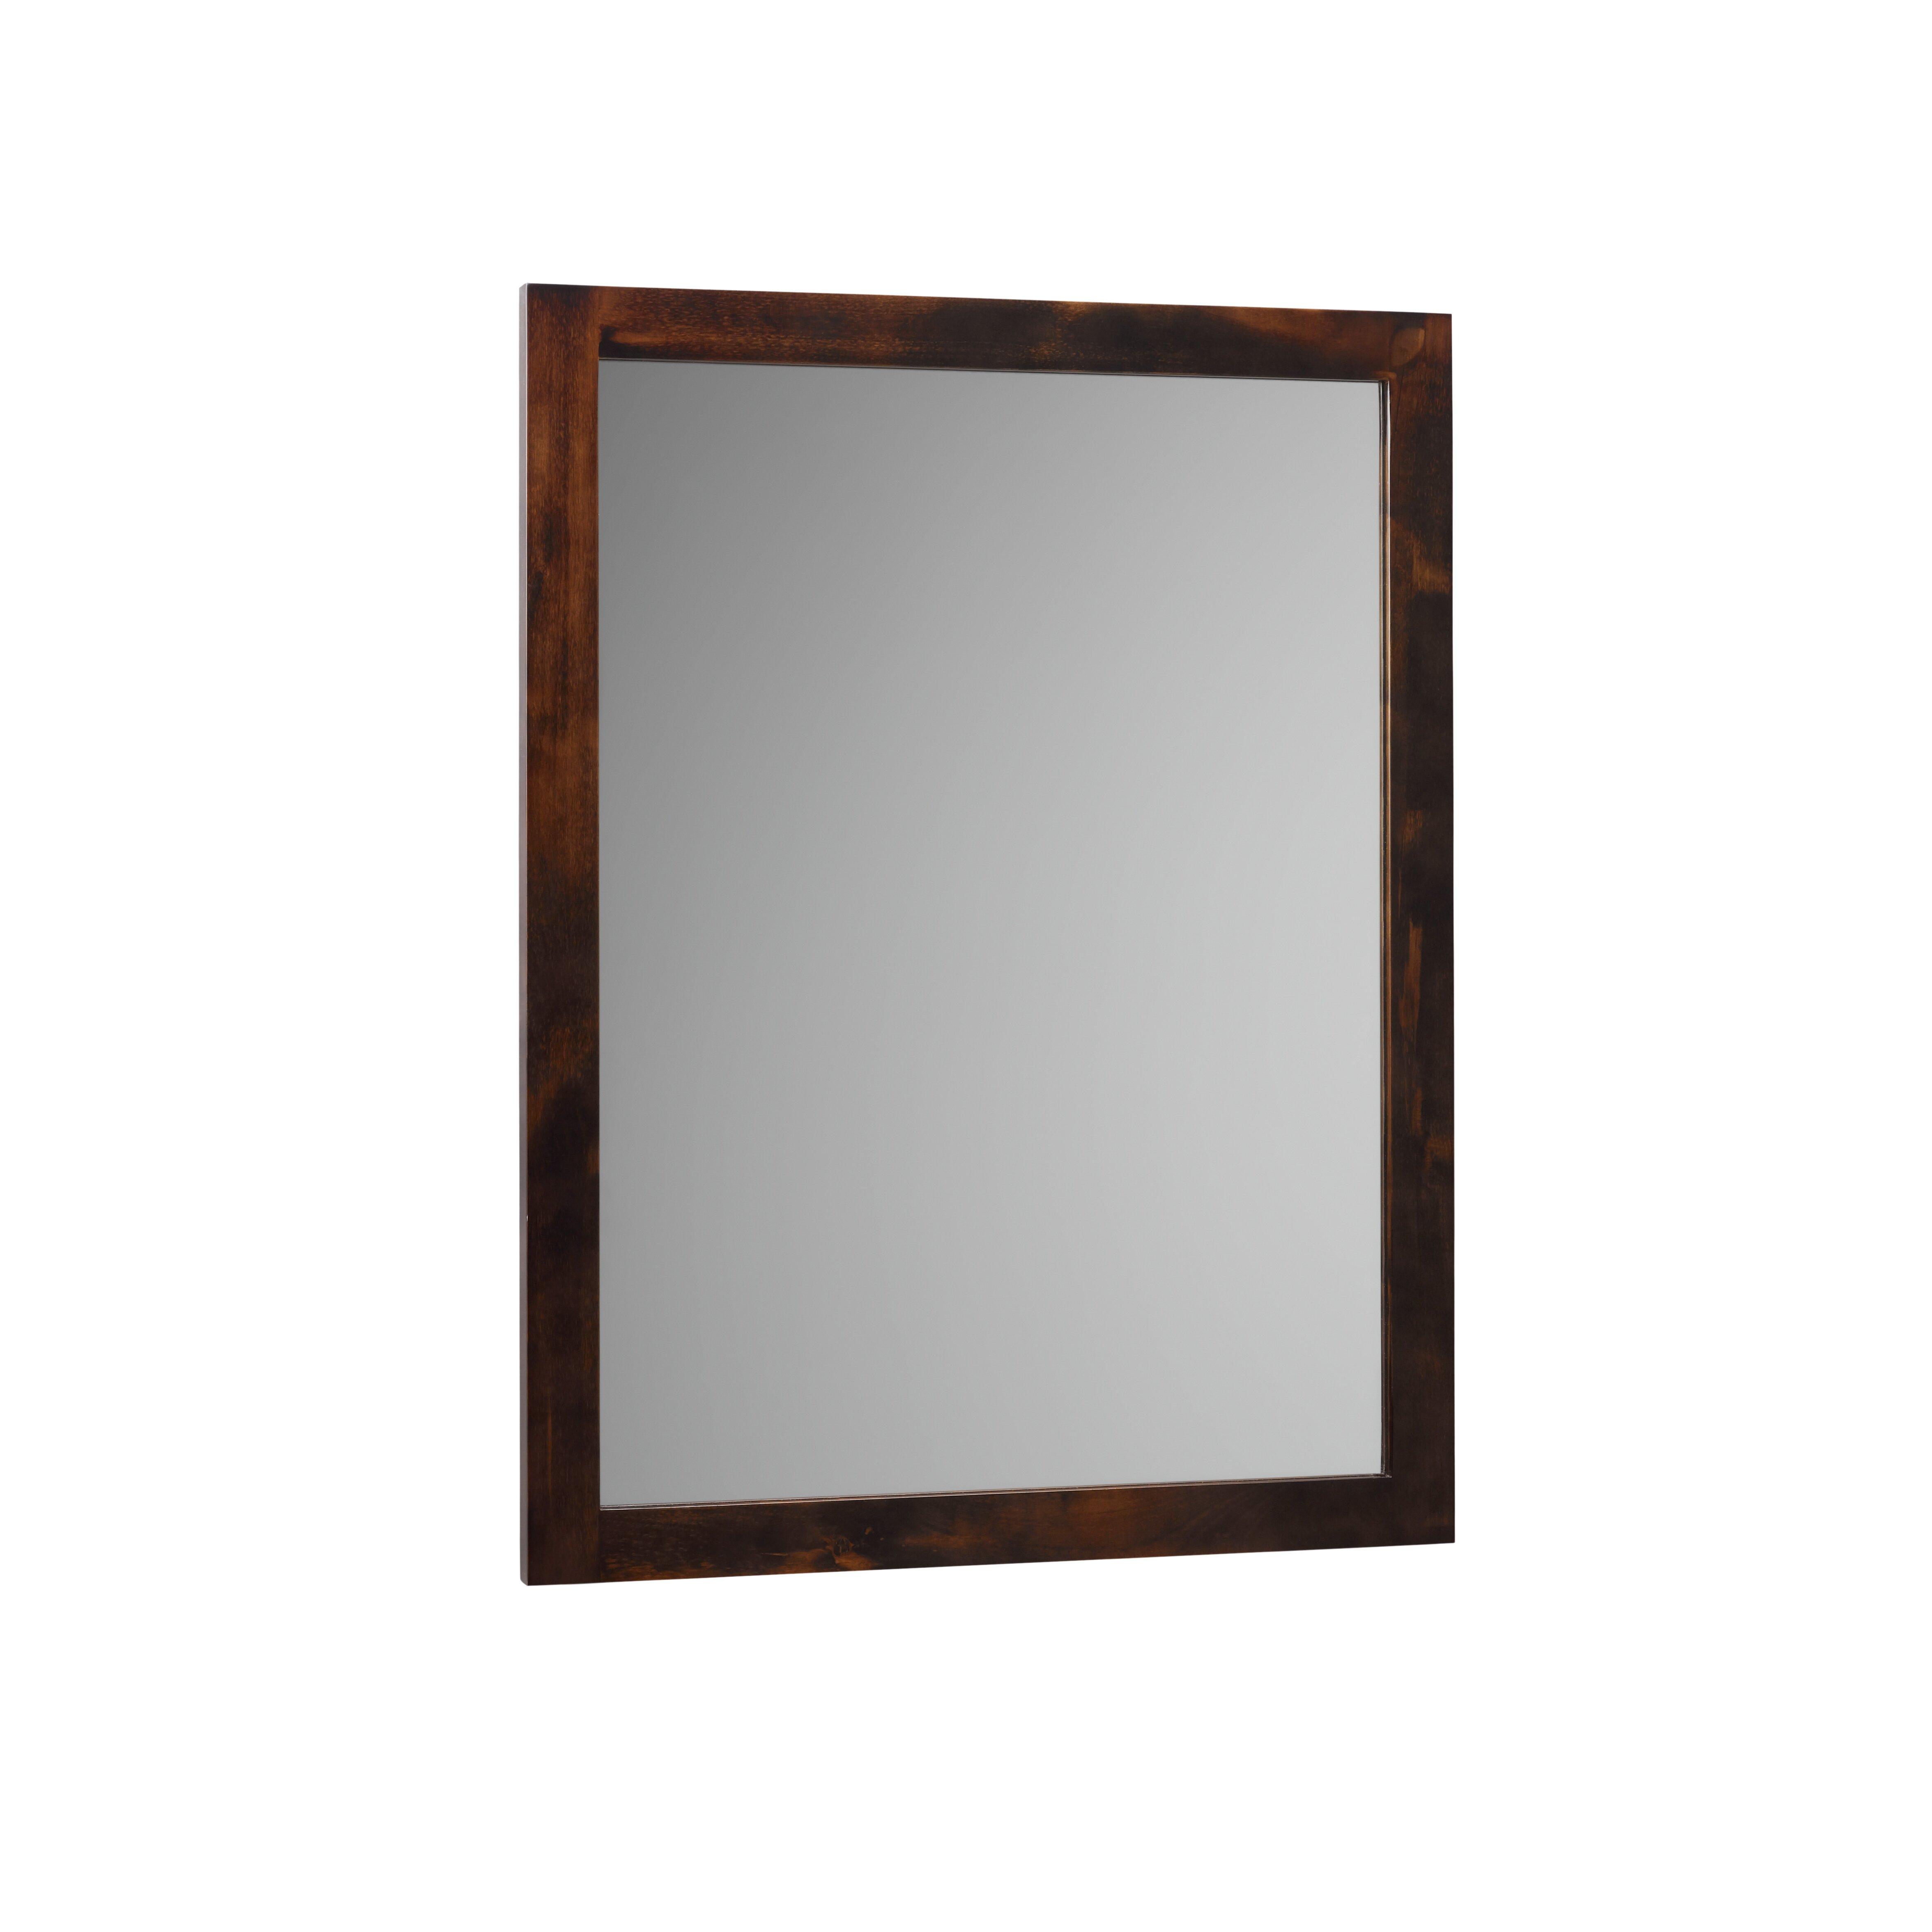 Contemporary Solid Wood Framed Bathroom Mirror in Vintage